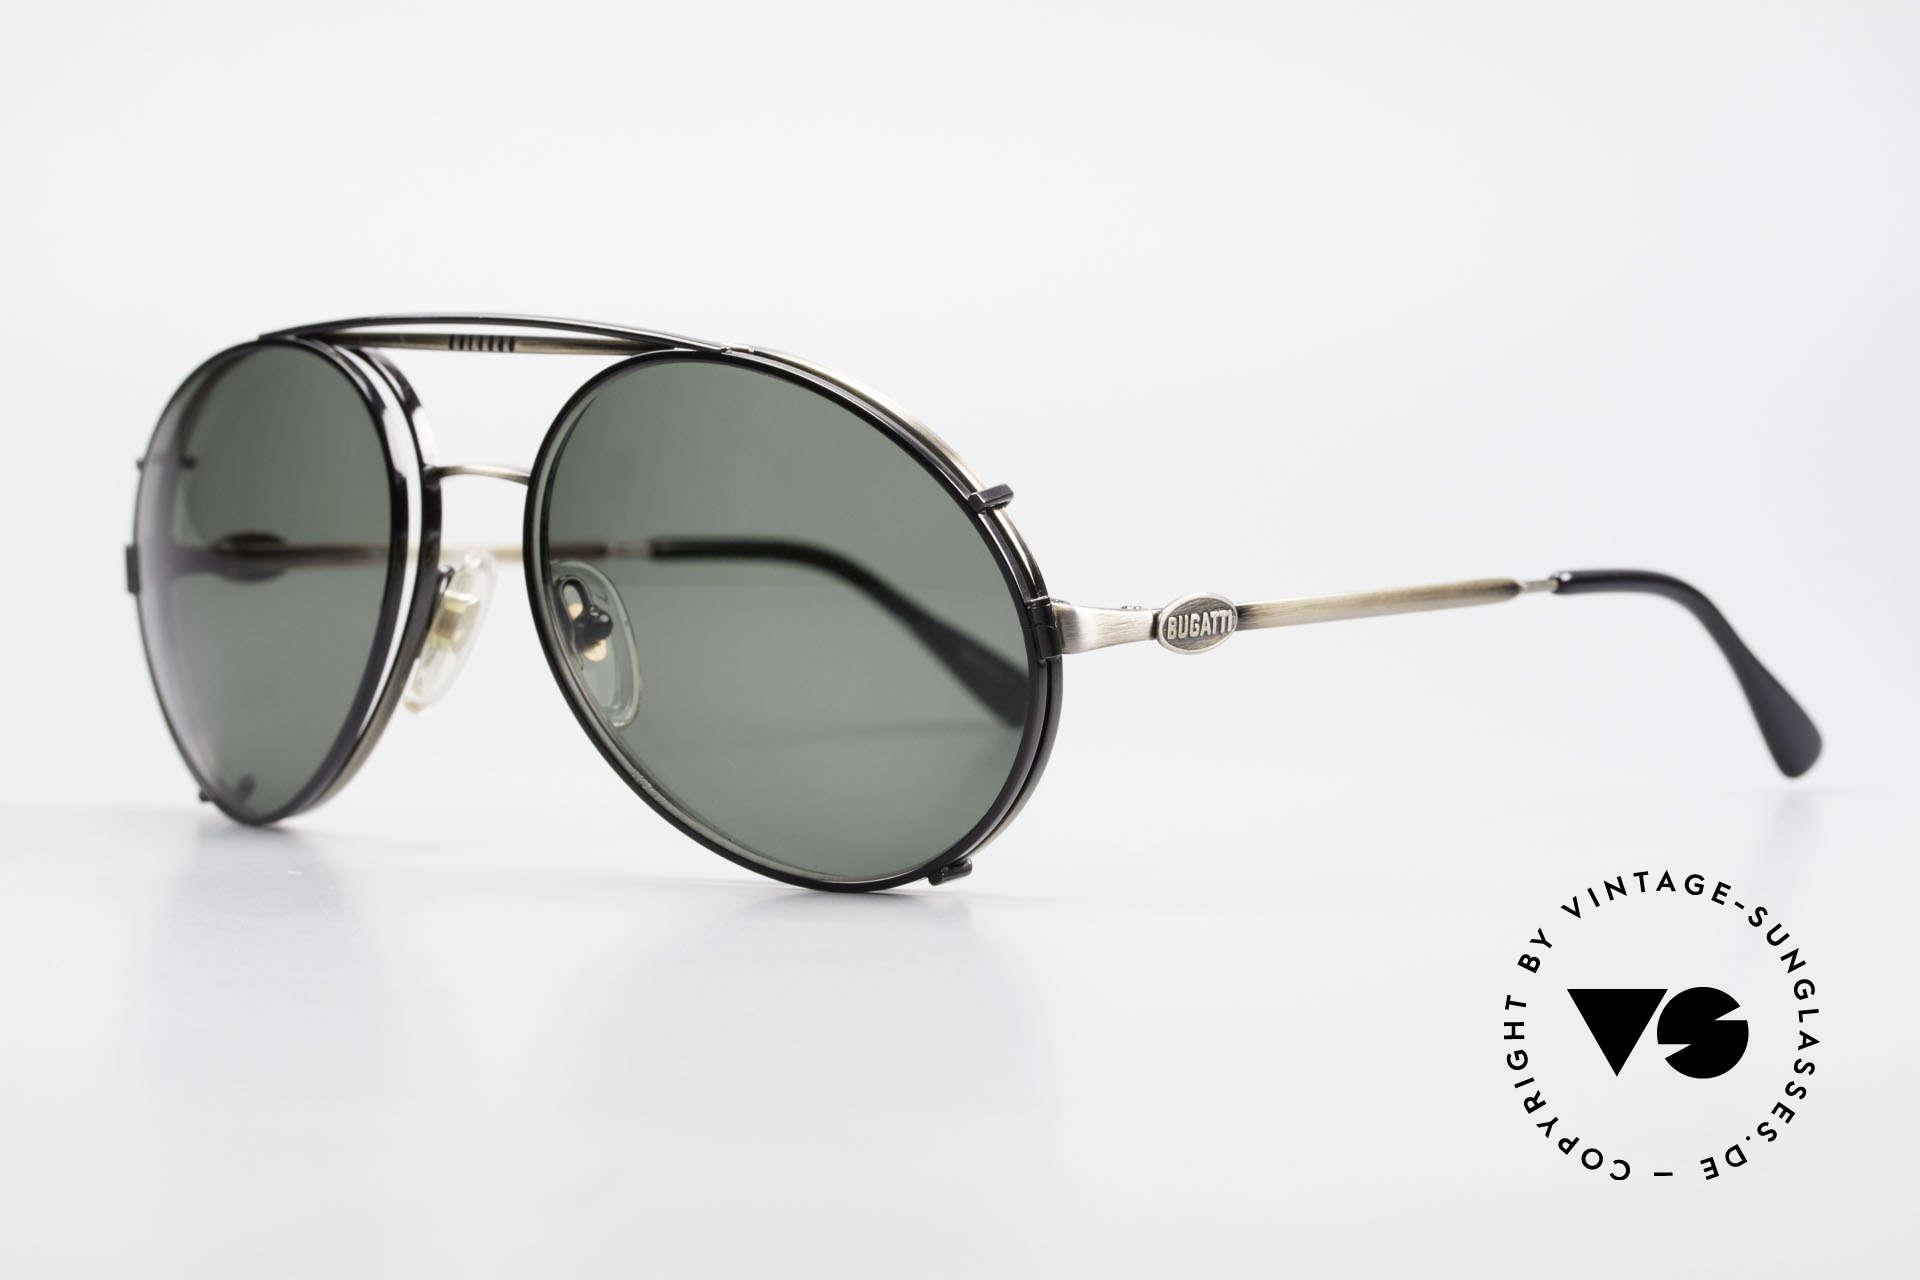 Bugatti 65282 Vintage Men's Glasses 1980's, eyeglass-frame with practical clip; size 56mm, Made for Men